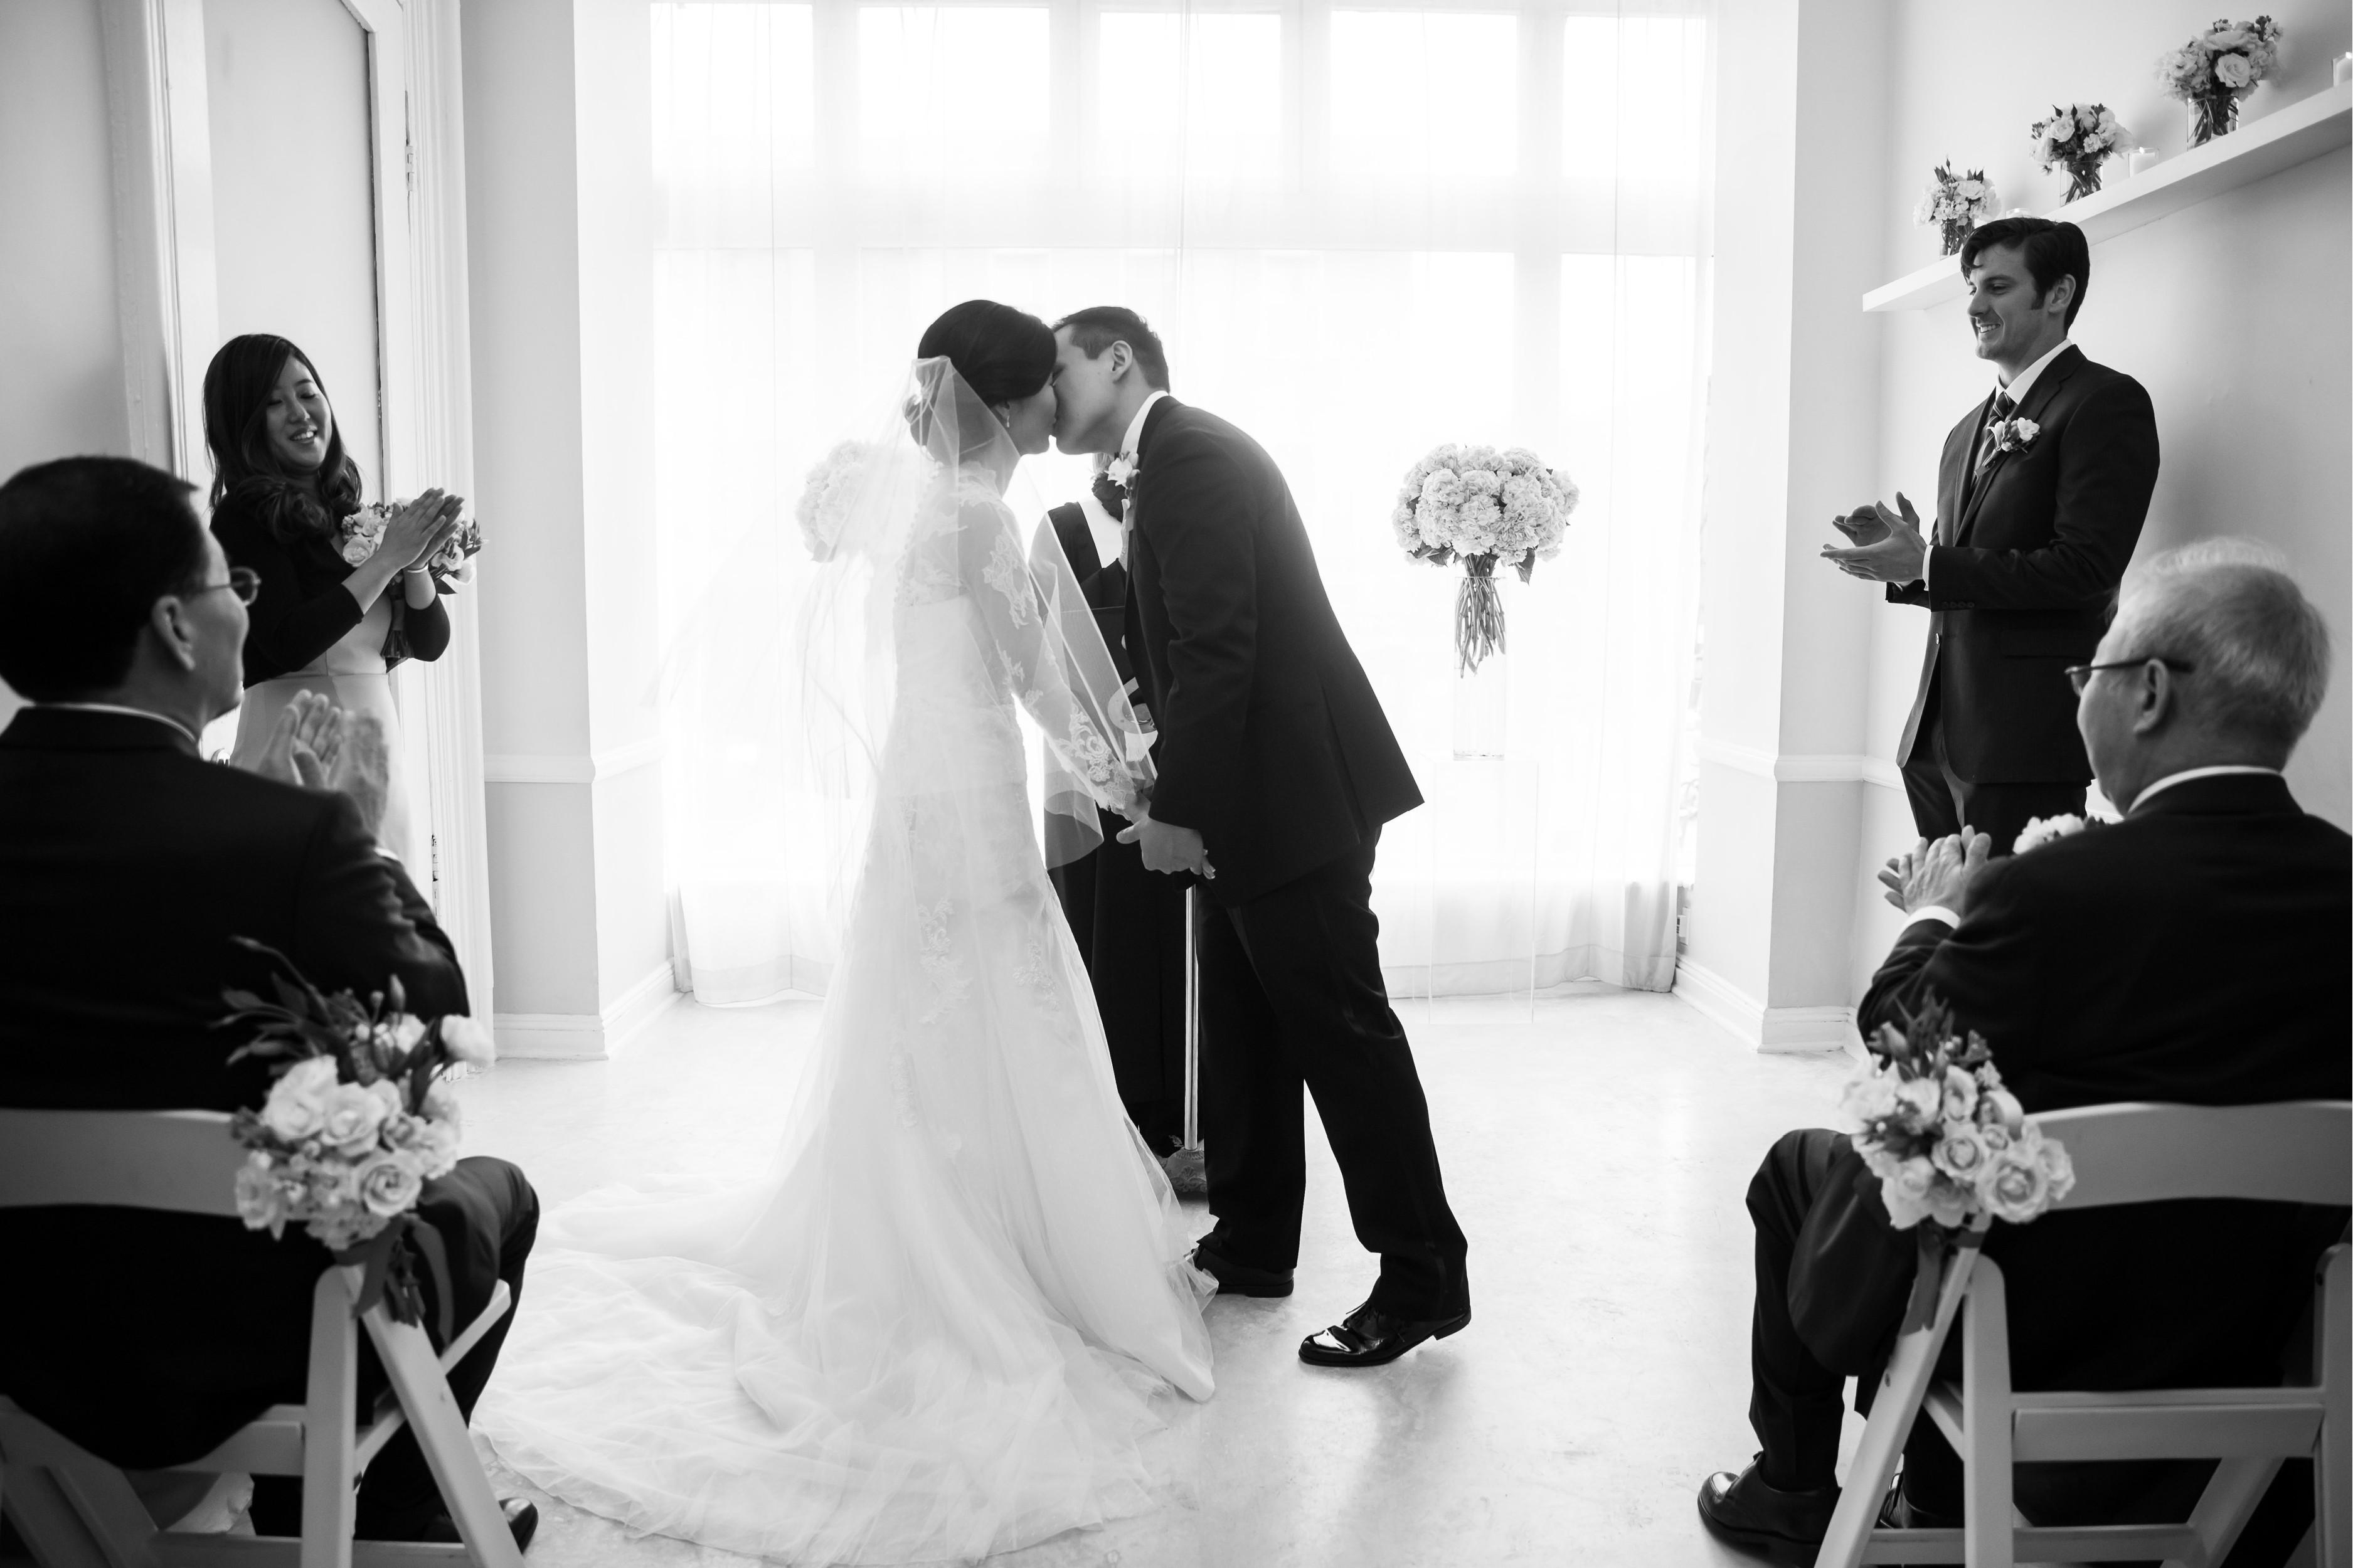 Emma_cleary_photography ici wedding10